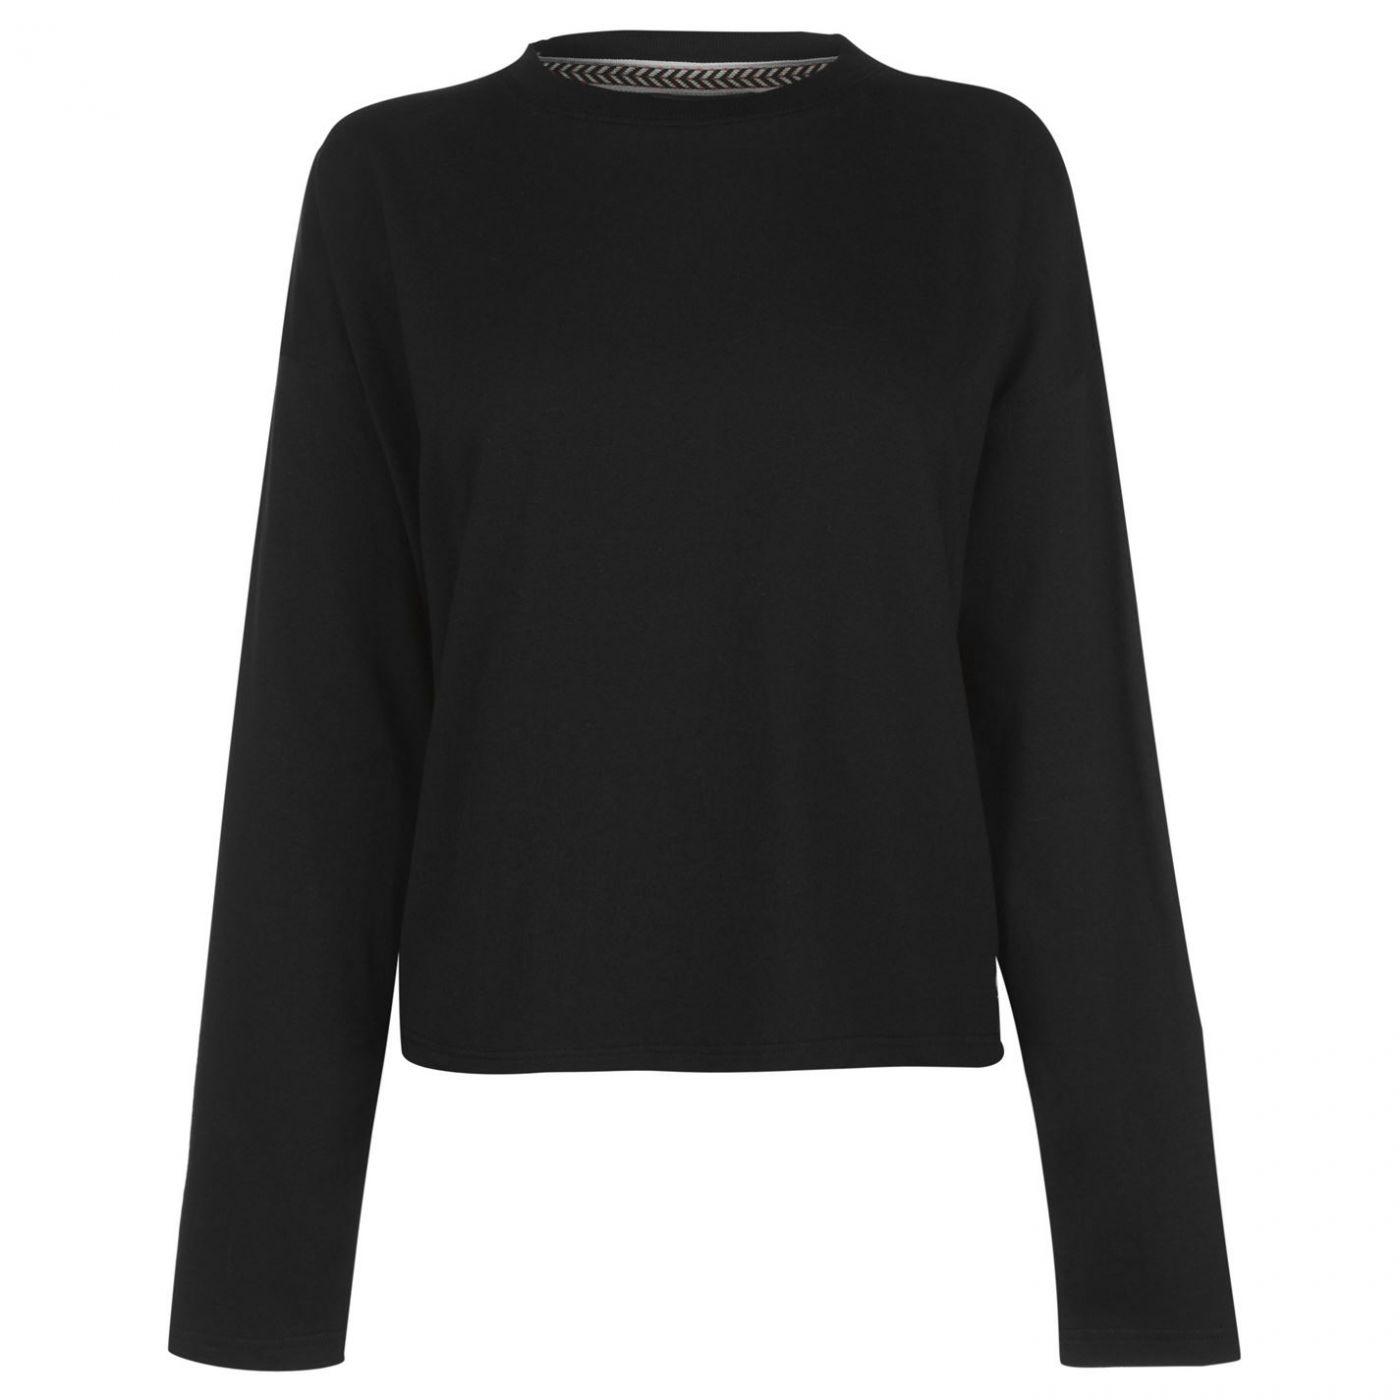 SoulCal Plain Crop Long Sleeve T Shirt Ladies